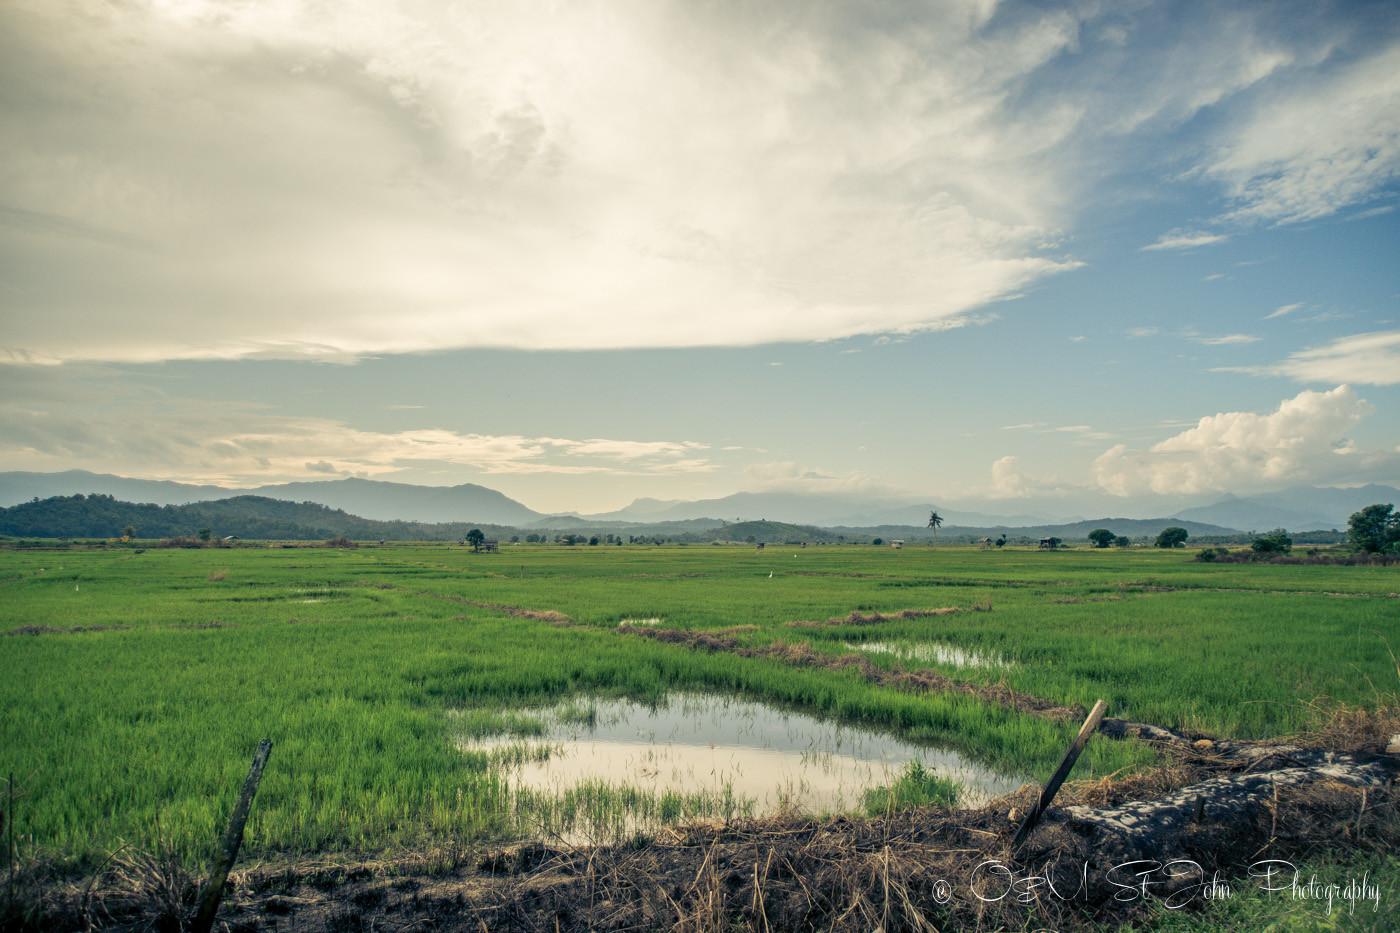 Rice paddies just outside of Kota Belud, Sabah, Malaysia